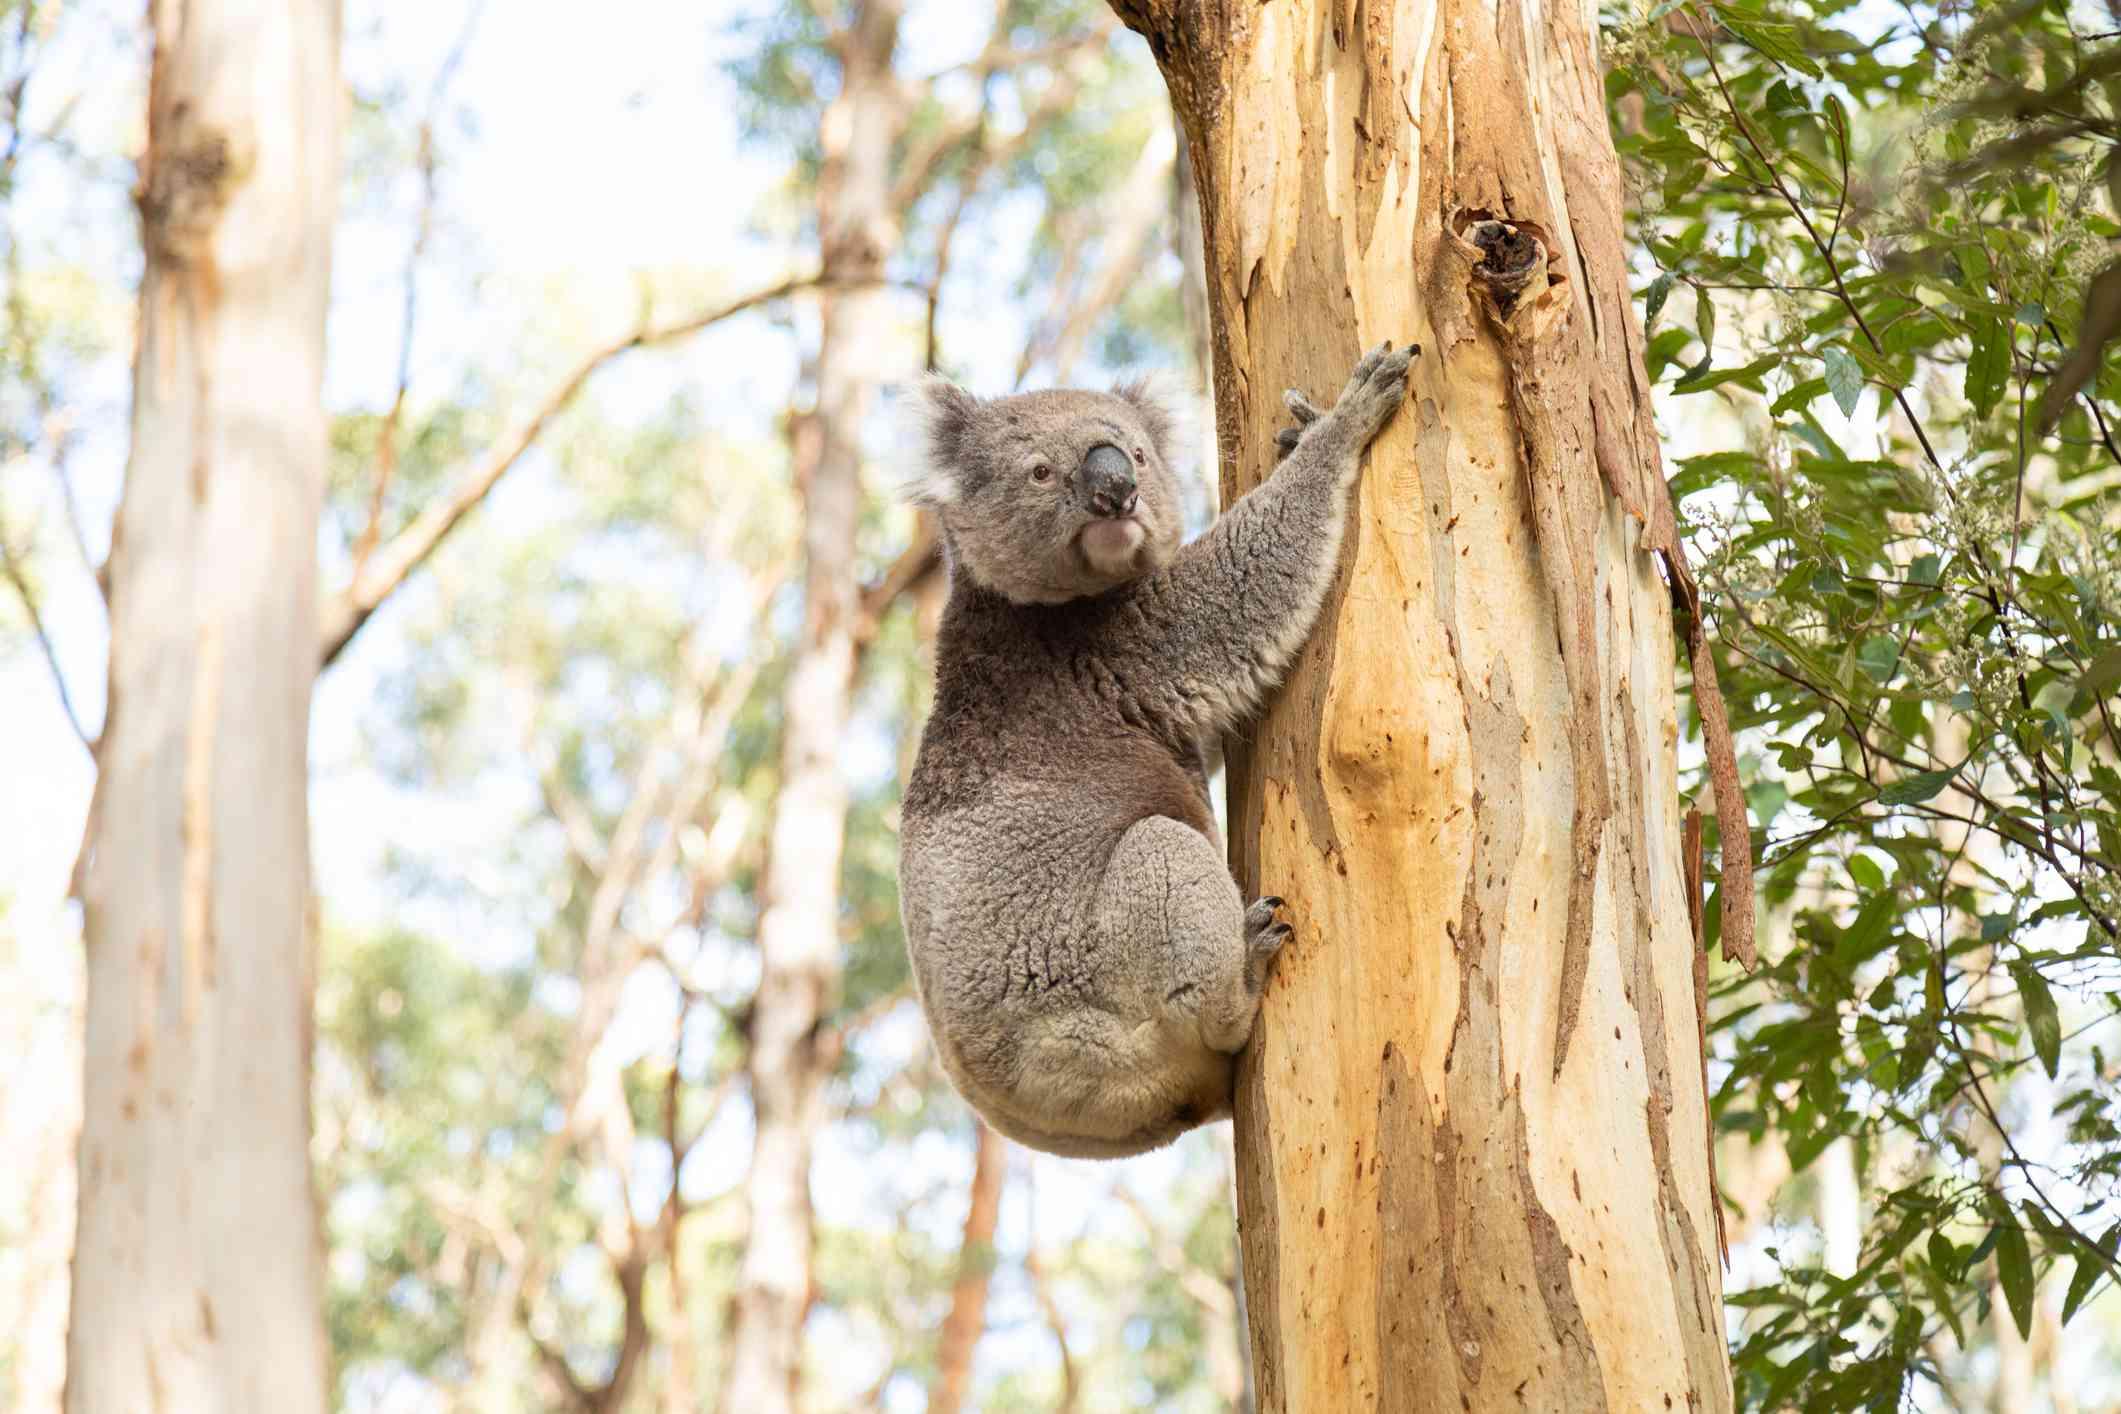 Koala holding onto a eucalyptus tree